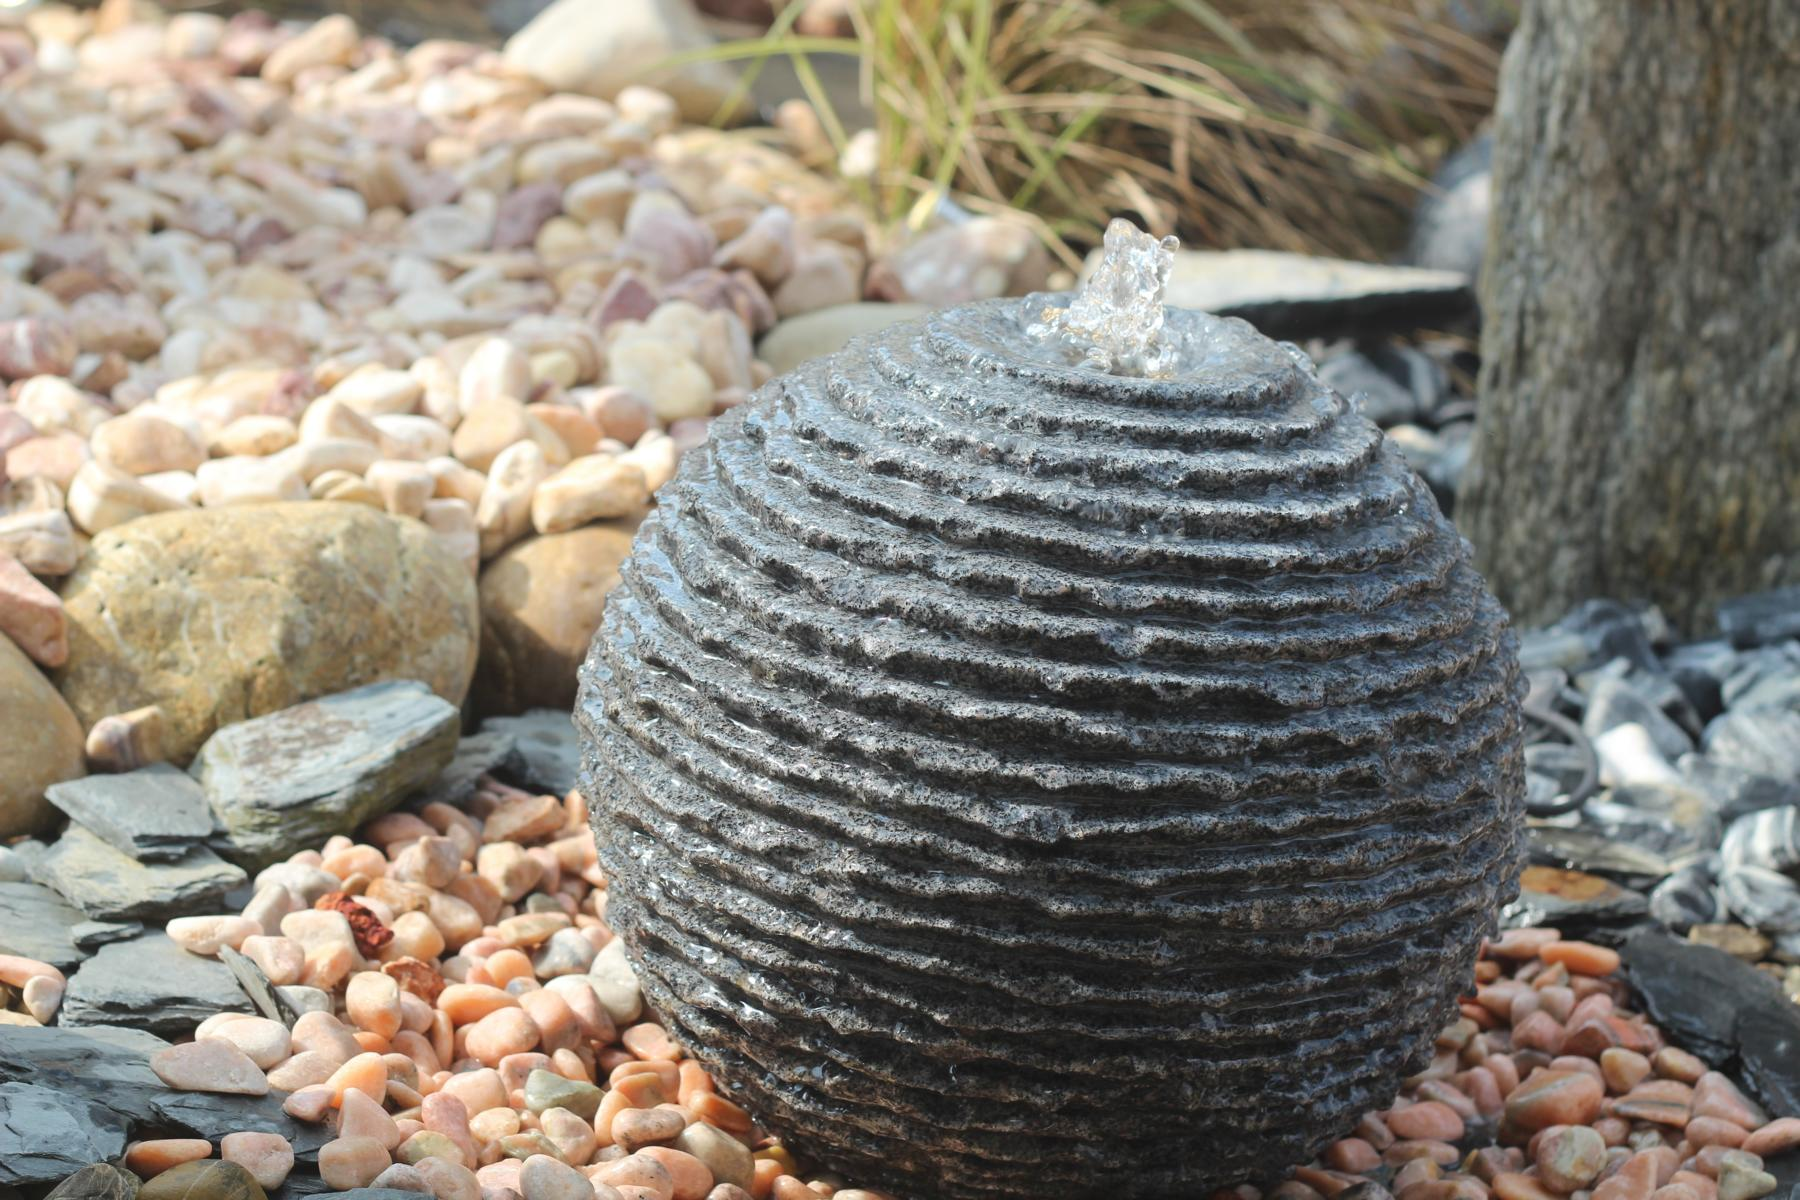 Wasserspiel set quellstein granit kugel saturn 35 inkl becken pumpe springbrunnen 100200007 for Gartenbrunnen kugel